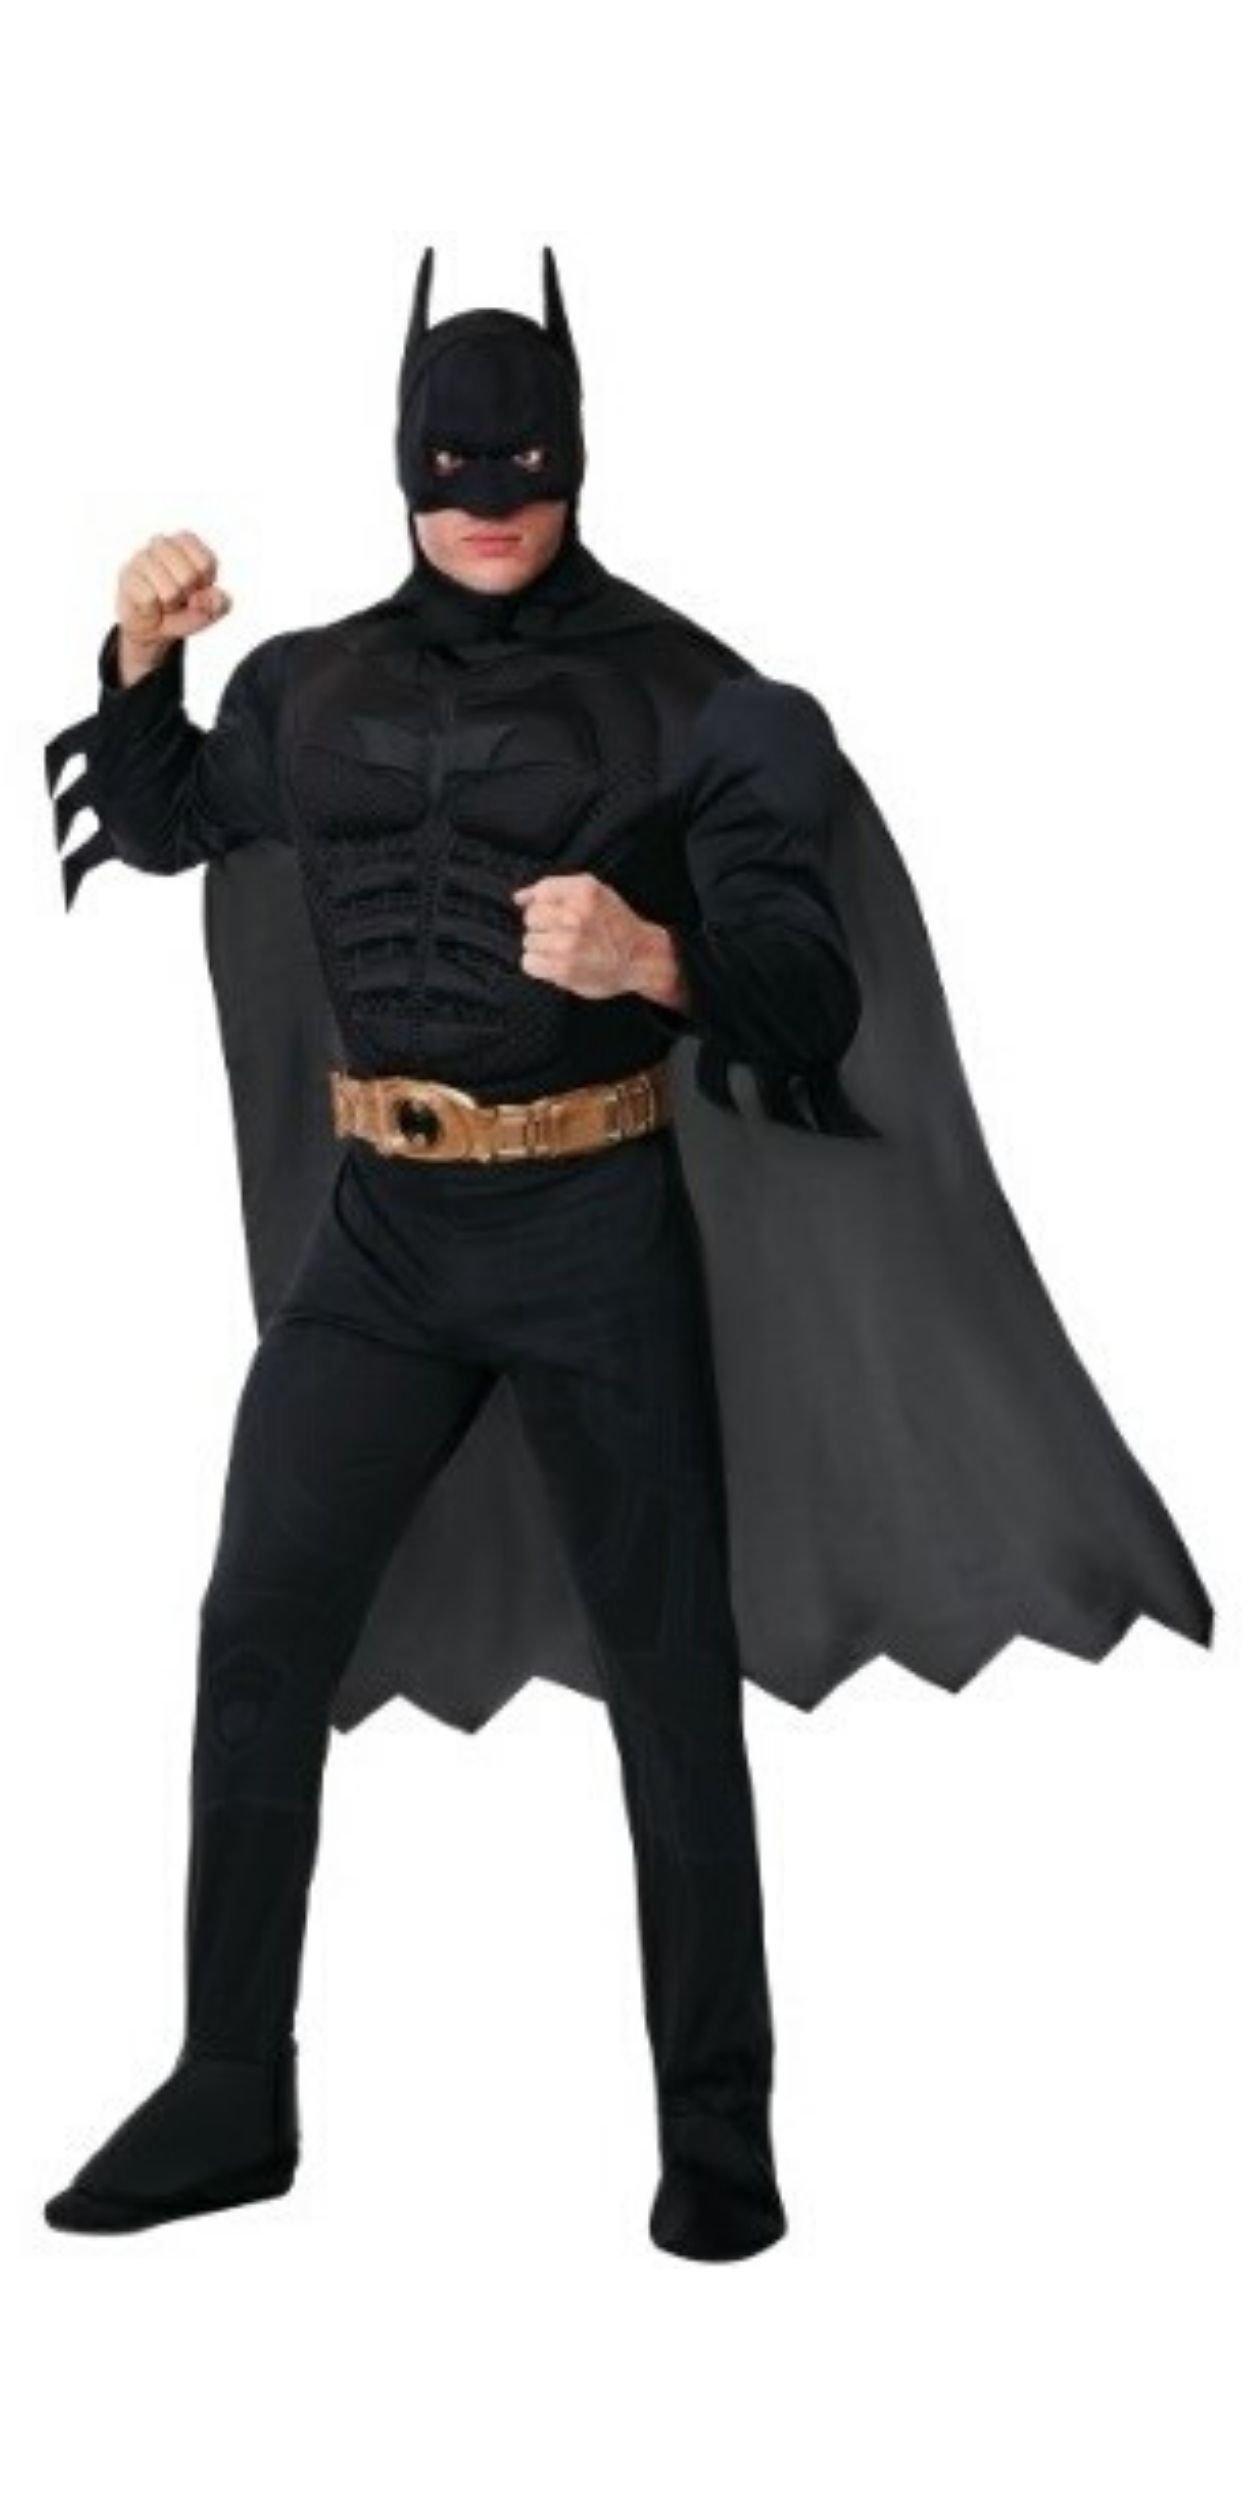 Man in Batman Party Costume